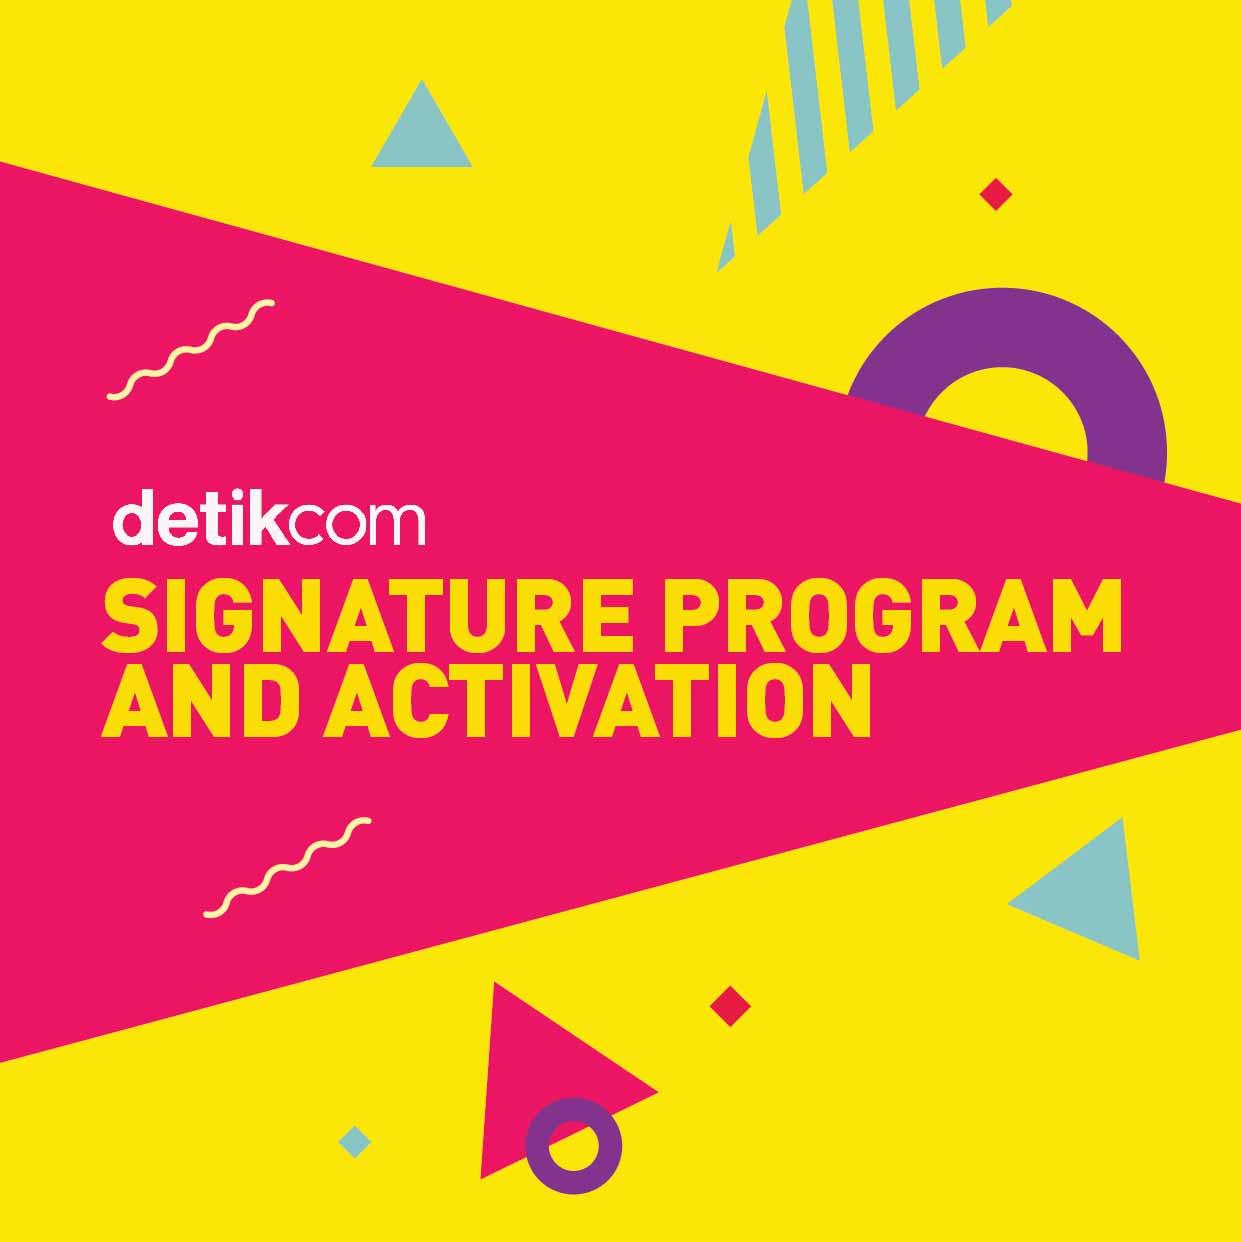 Singnature Program & Activation